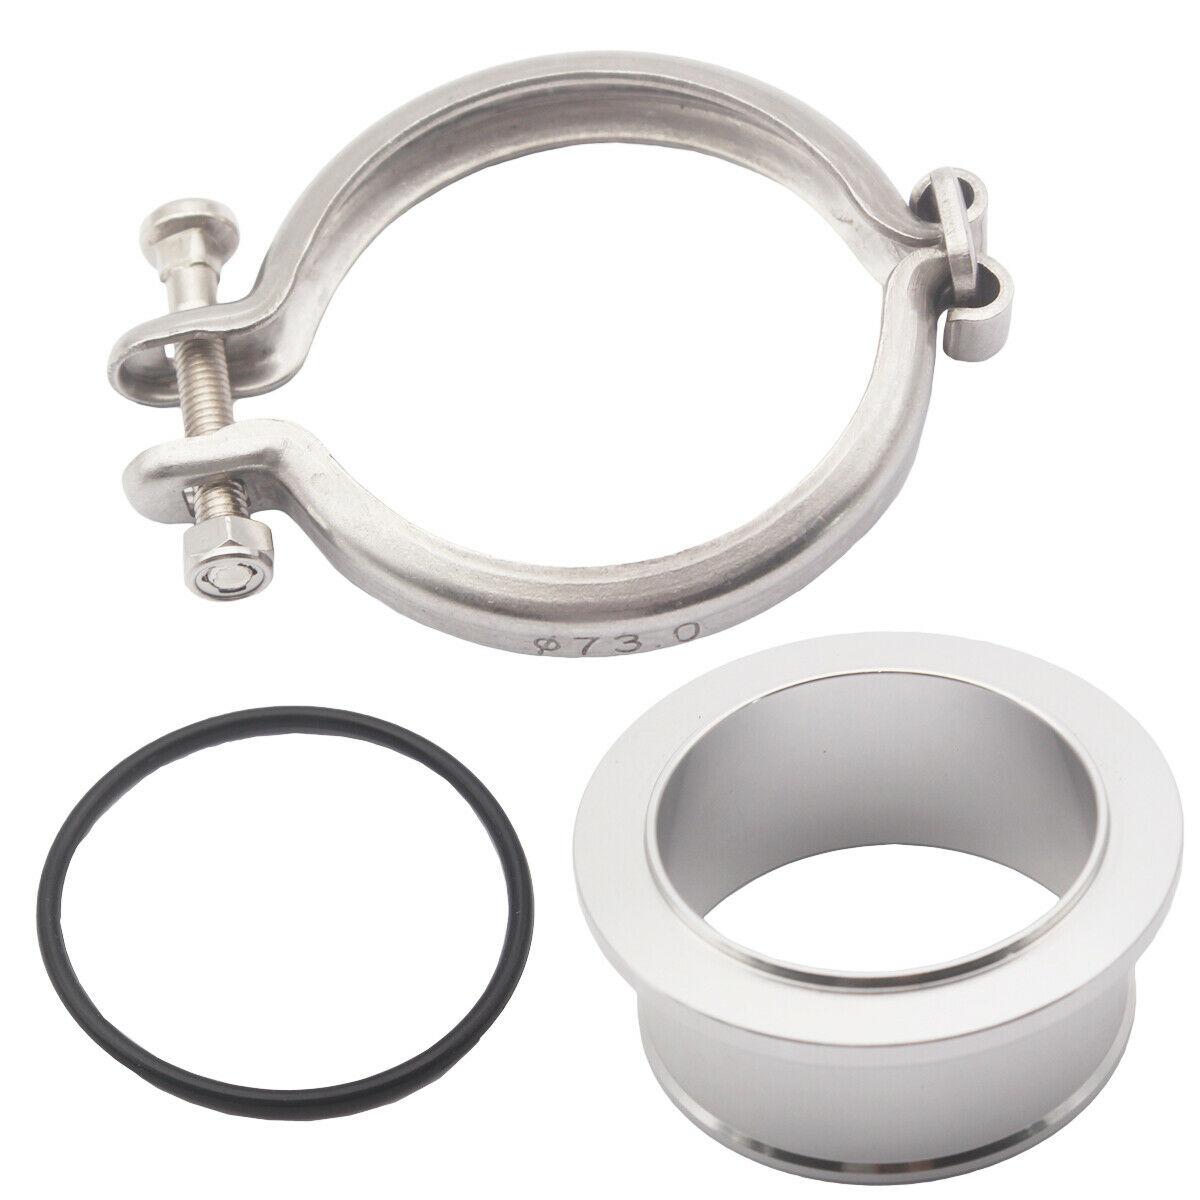 Para holset hx35 hx35w hx40w turbo compressor v-band flange braçadeira cummins 5.9l